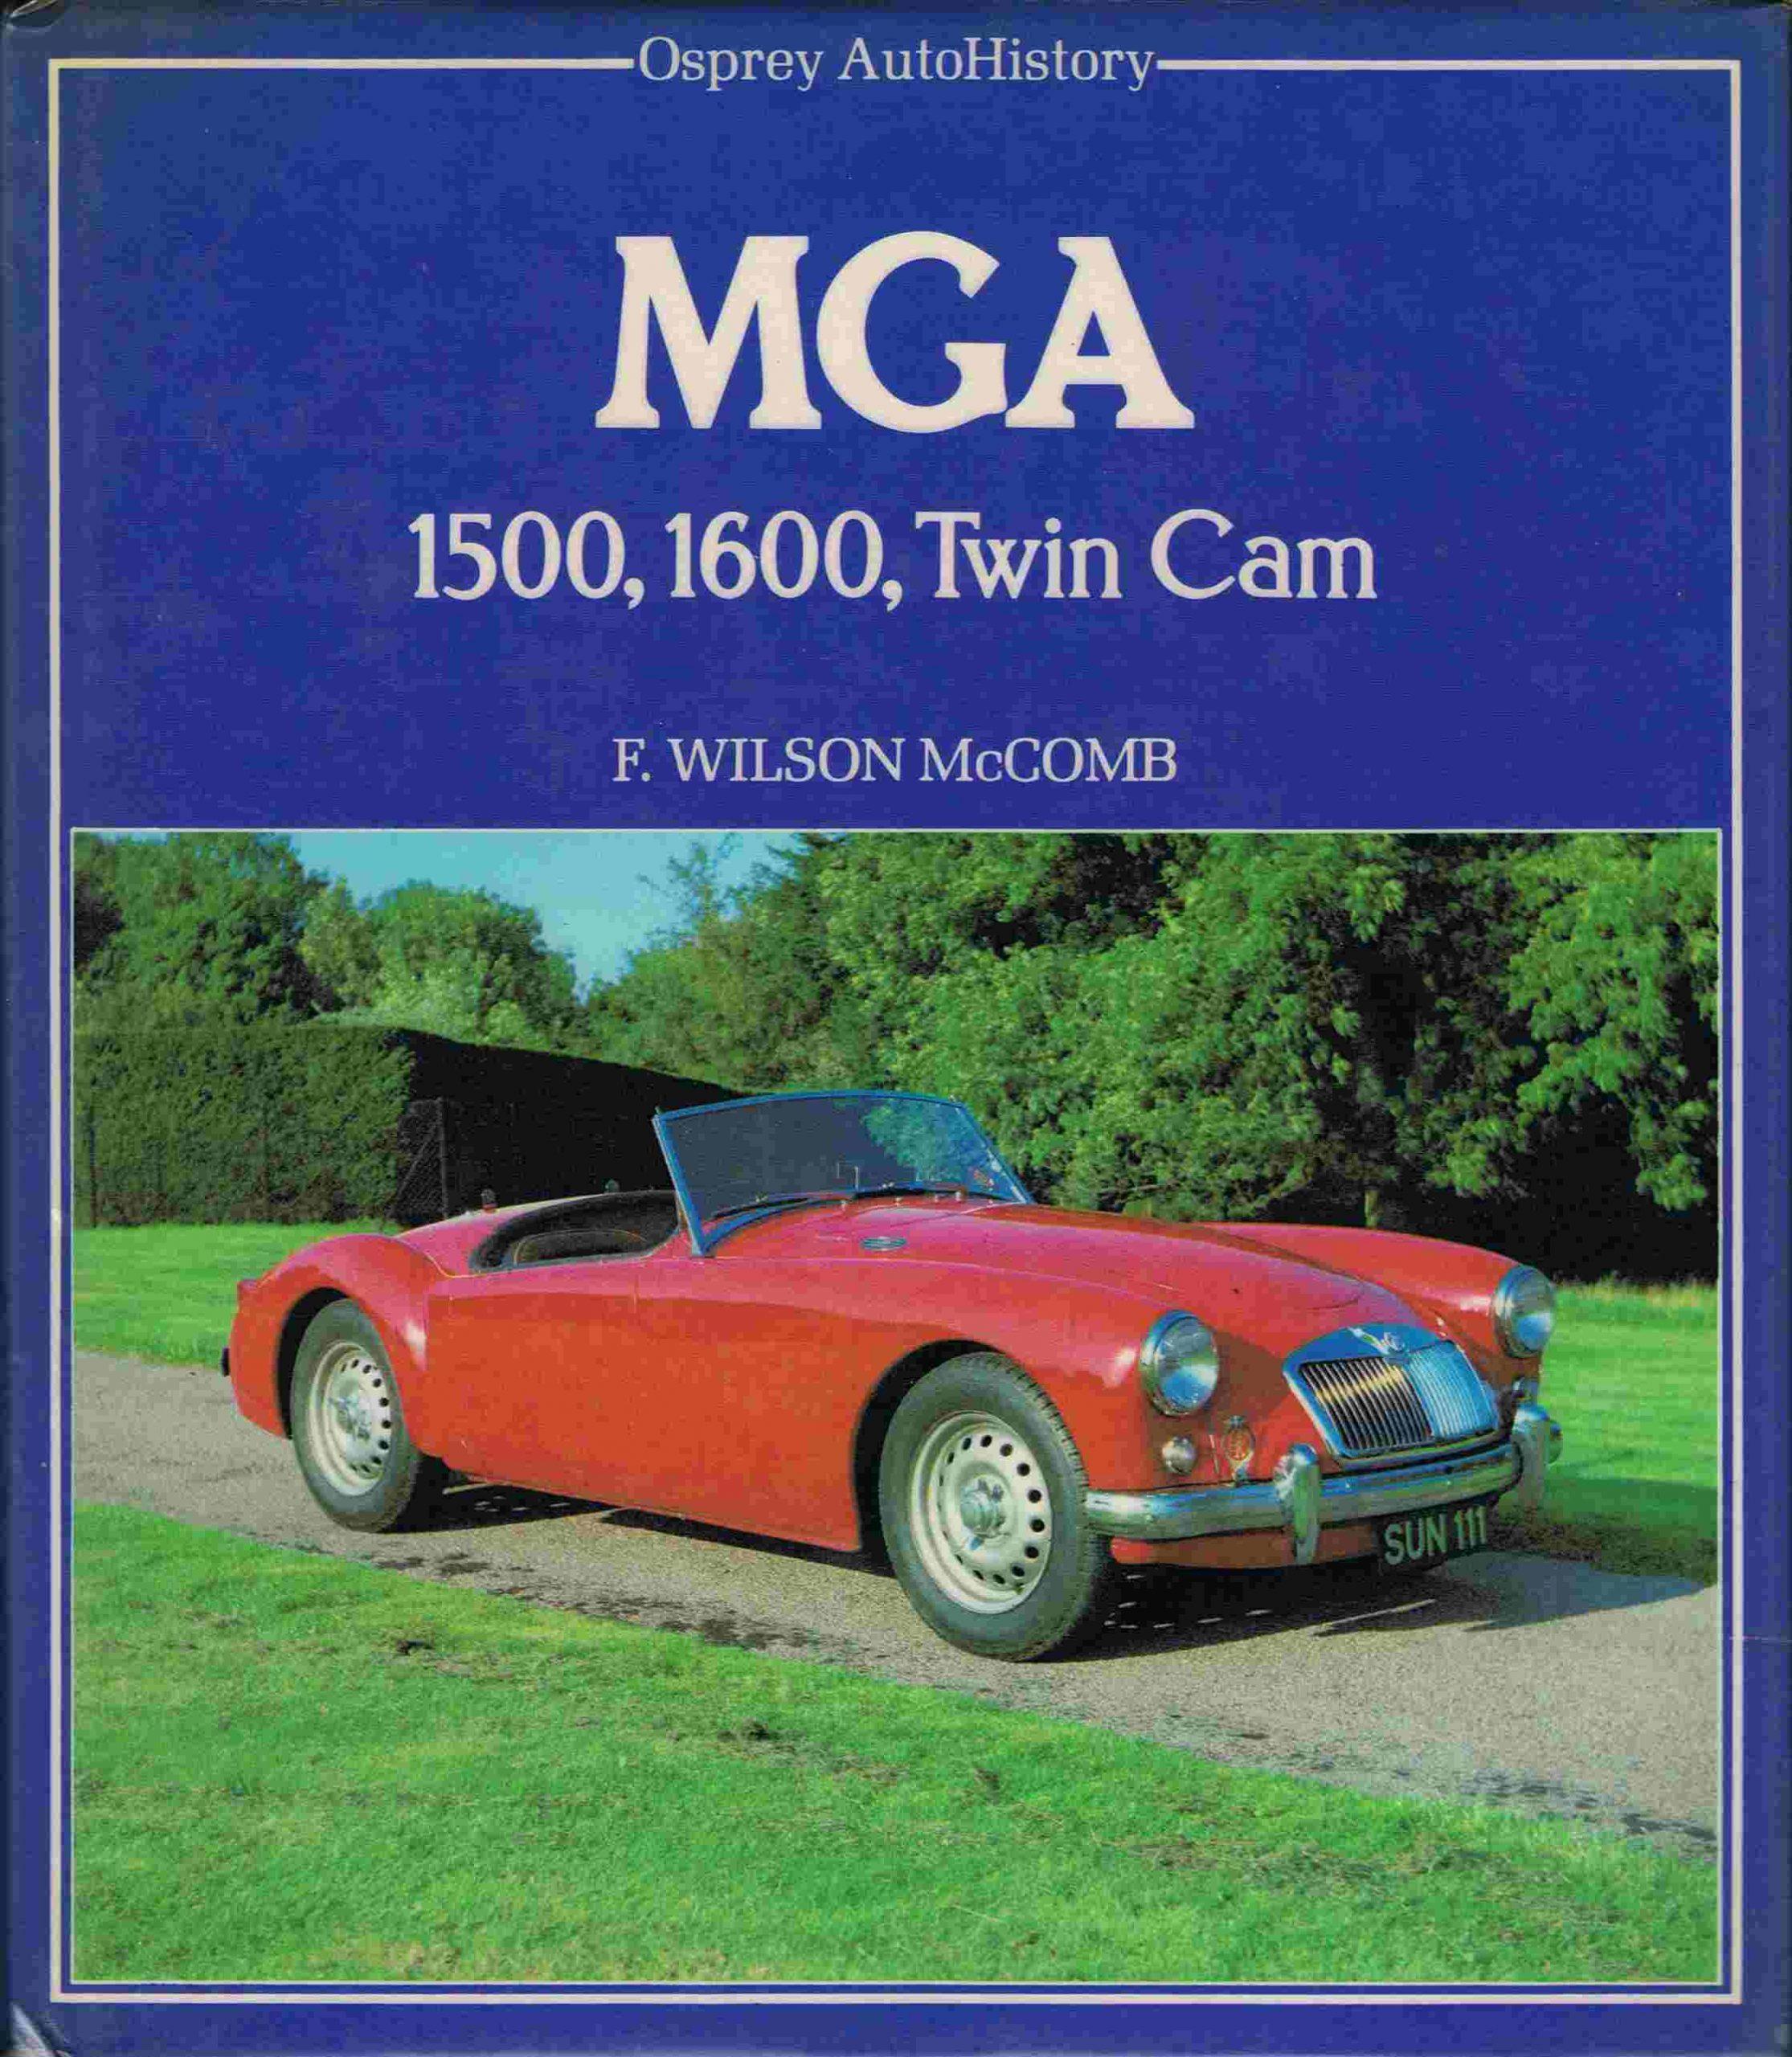 MGA 1500, 1600, Twin Cam